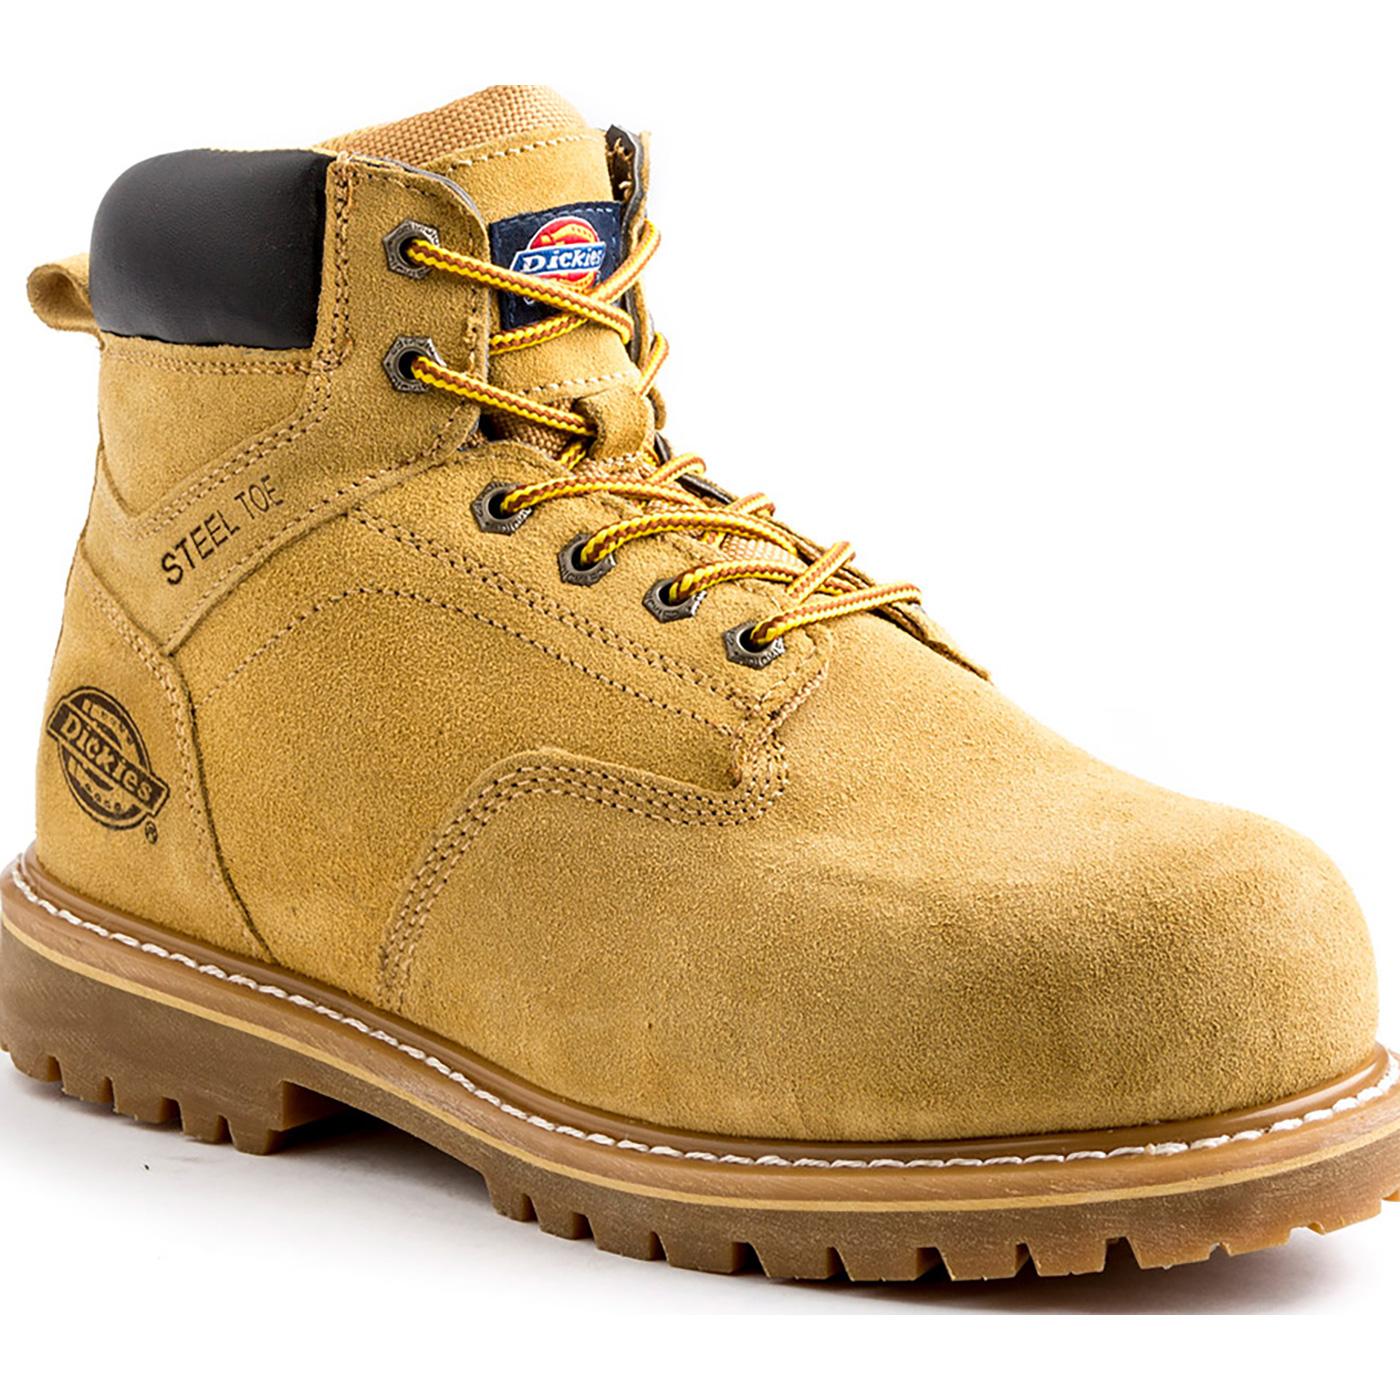 07e11827e20 Dickies Prowler Men's 6 Inch Steel Toe Electrical Hazard Work Boot